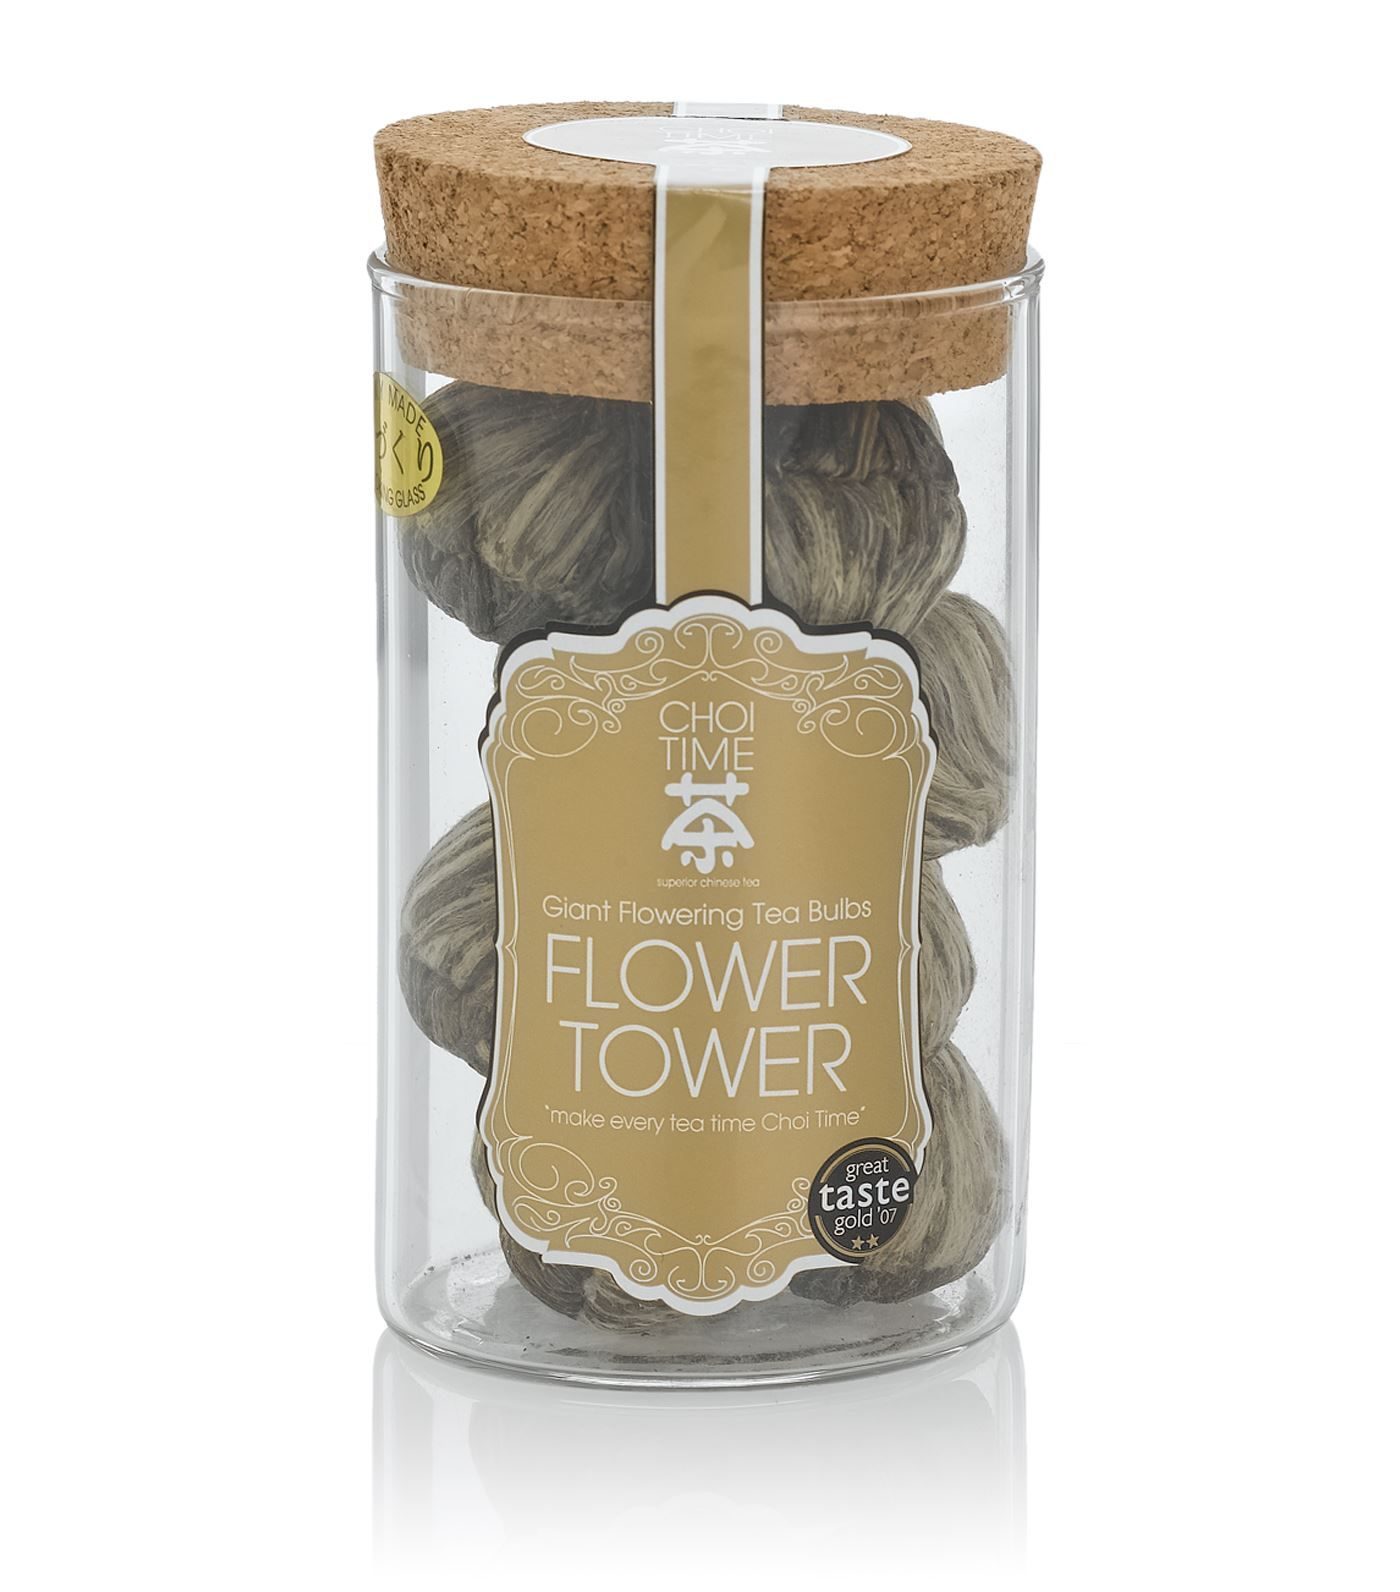 Choi Time Flower Tower Giant Flowering Tea (12 bulbs